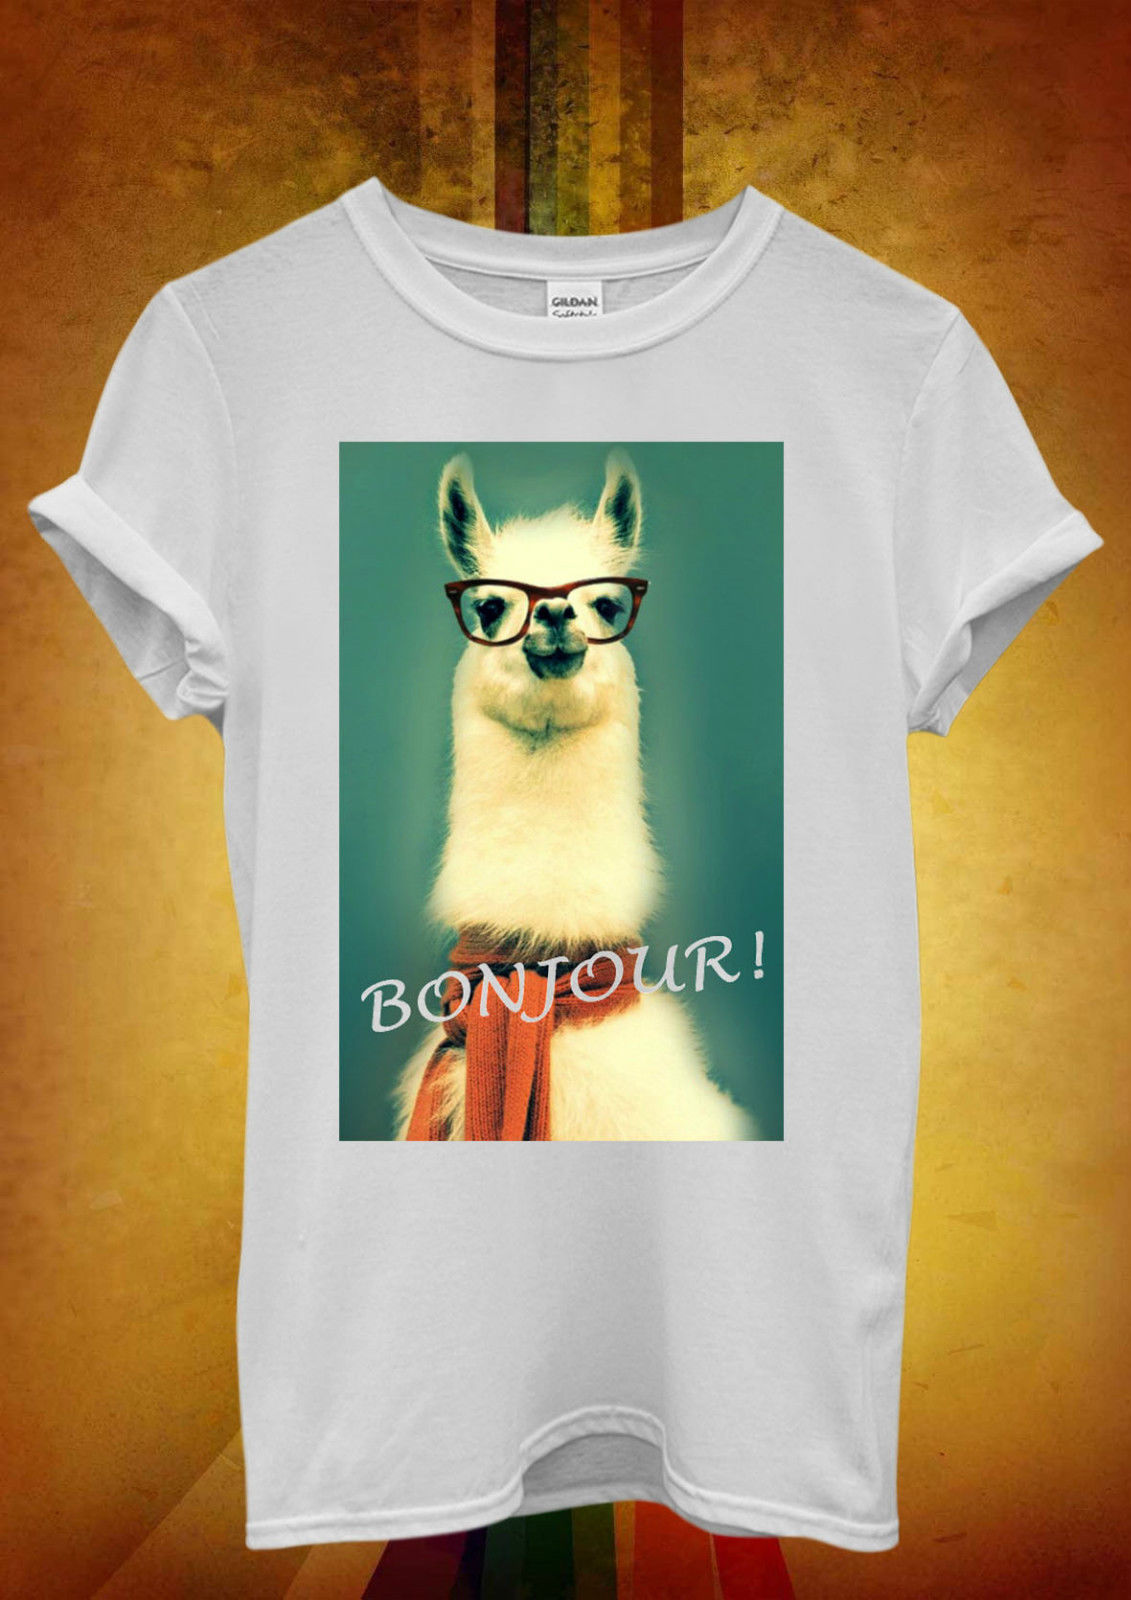 Llama Lama Bonjour Cool Hipster divertido hombres mujeres Unisex camiseta Top chaleco 403 100% de algodón de manga corta o-cuello Tops camisetas